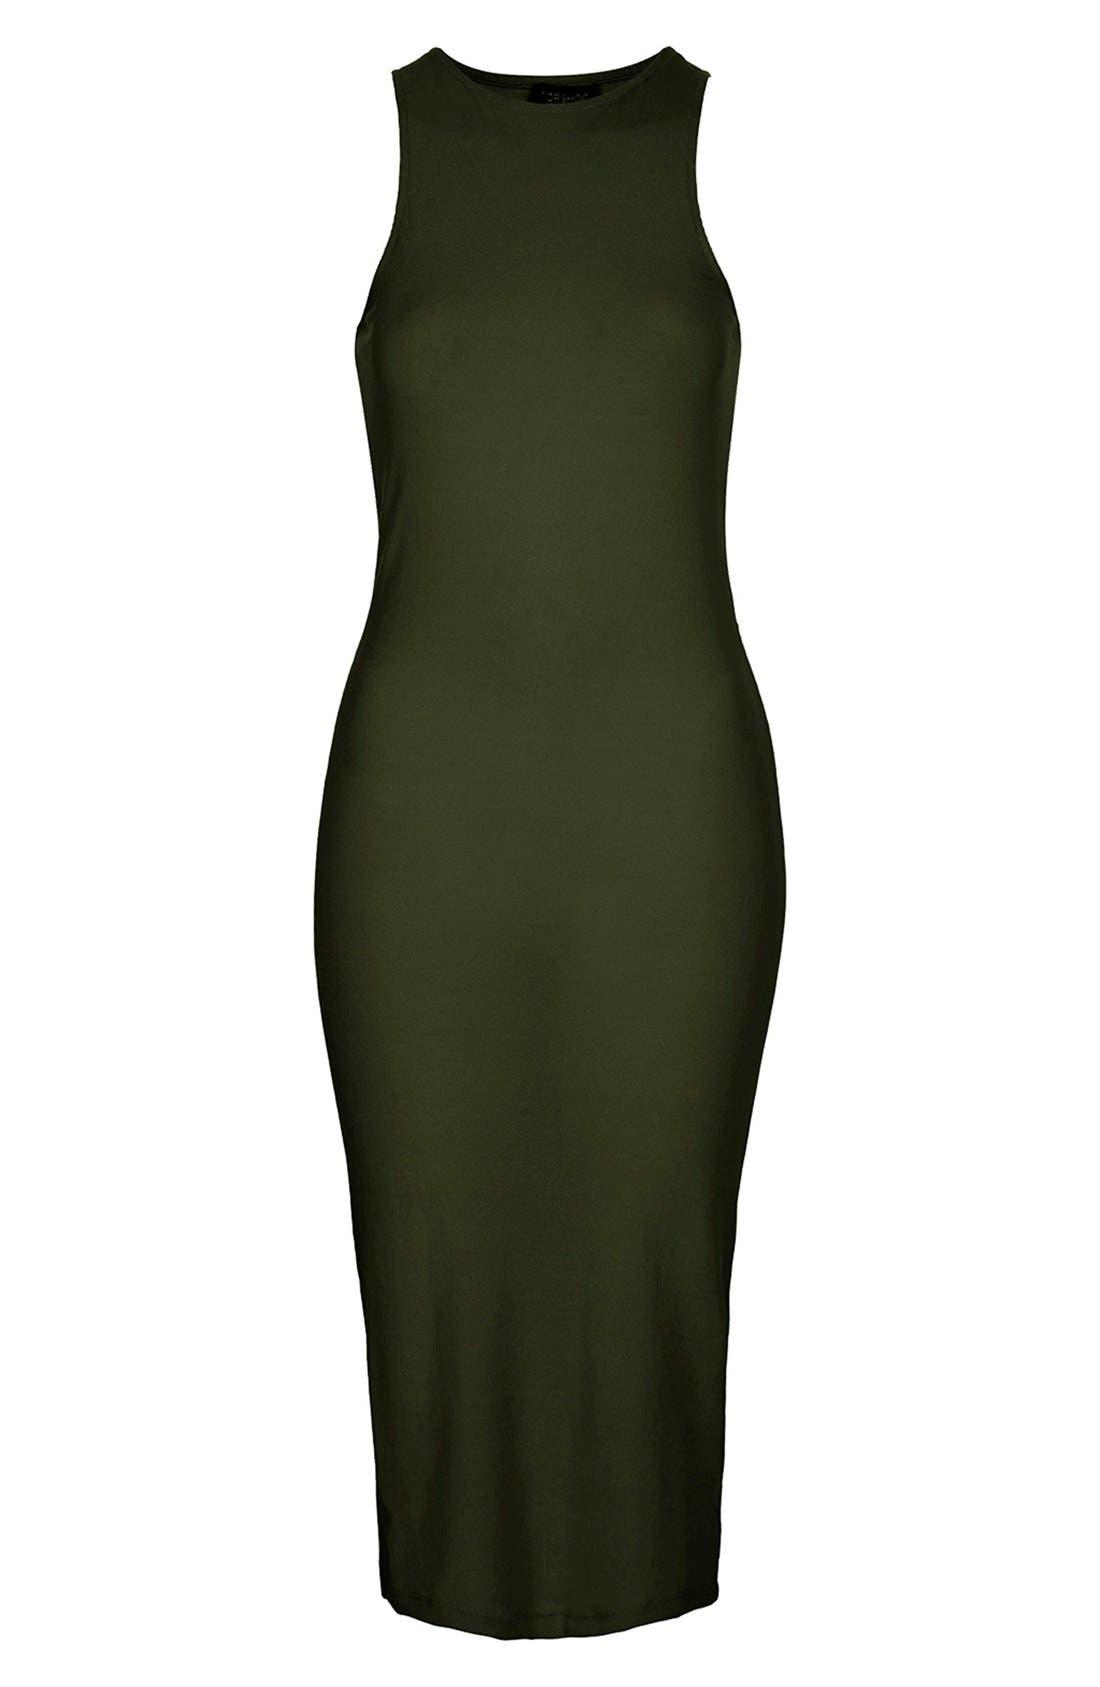 Alternate Image 3  - Topshop Ribbed Tank Dress